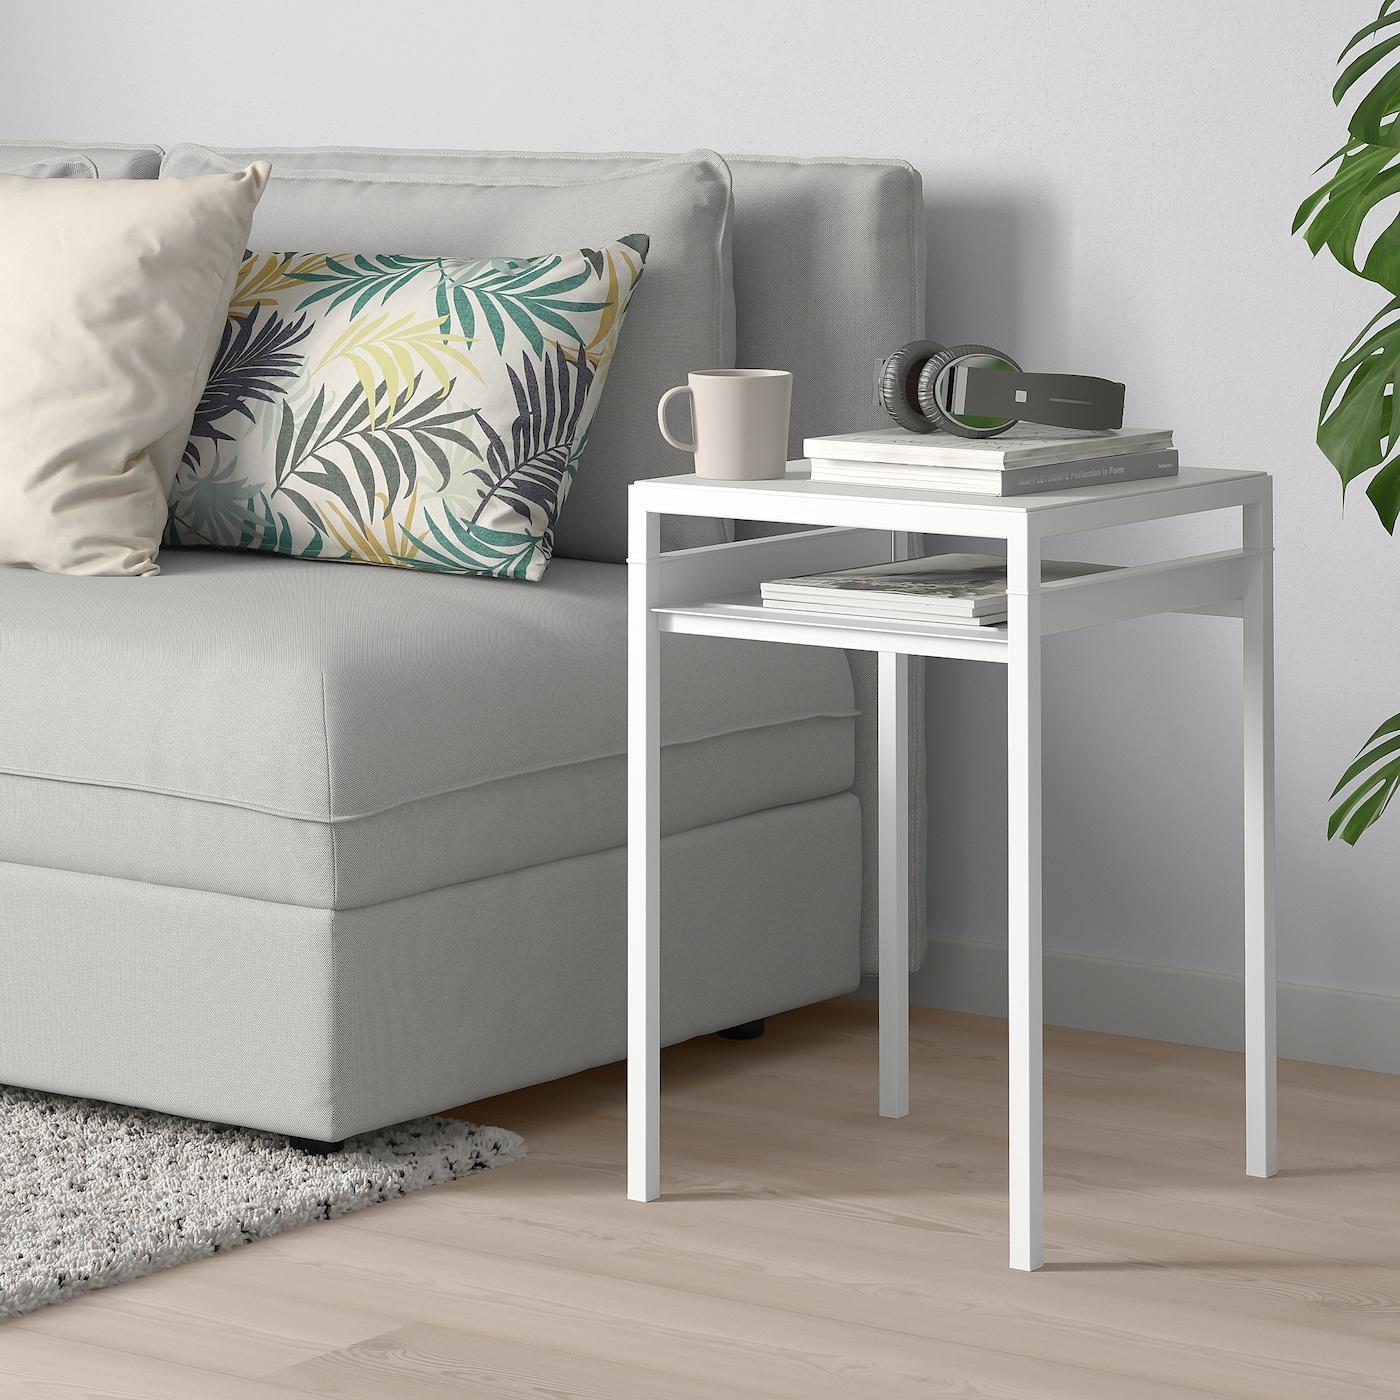 NYBODA Mesa auxiliar tablero reversible Ikea, negrobeige, blancogris